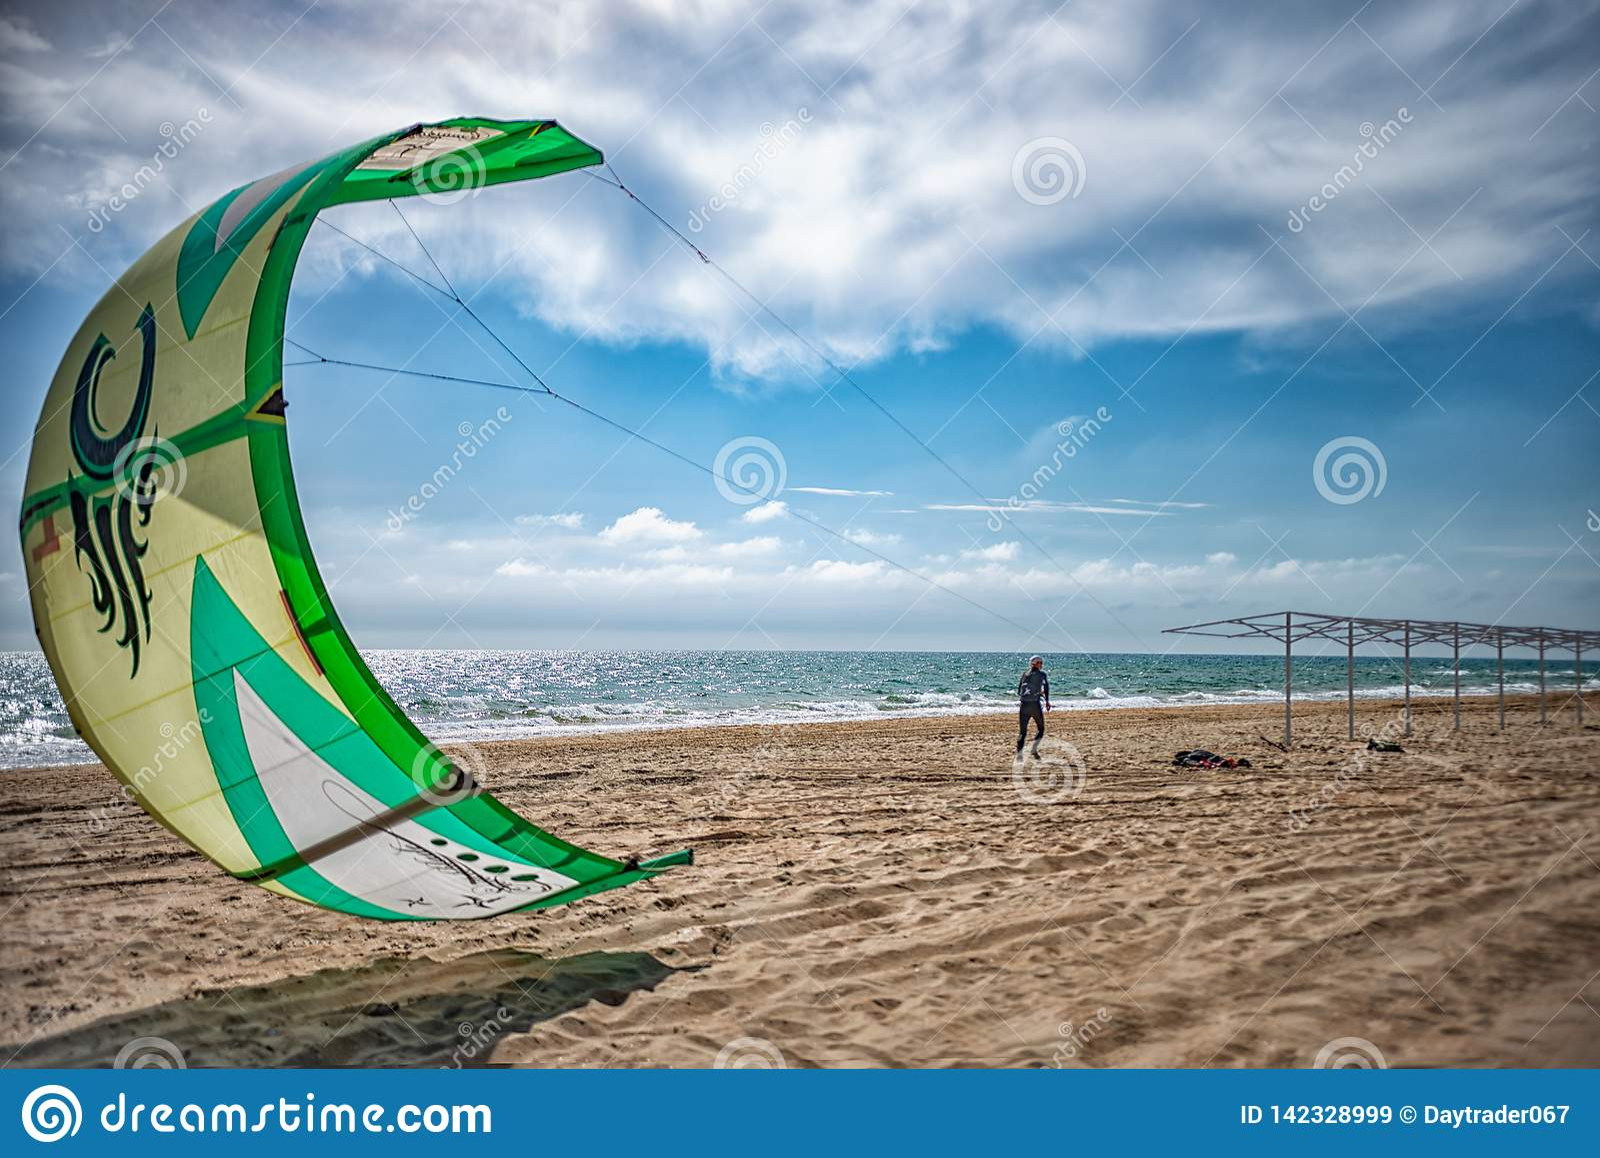 Rosja Anapa 12 07 2018 Skydiver na plaży na słonecznym dniu